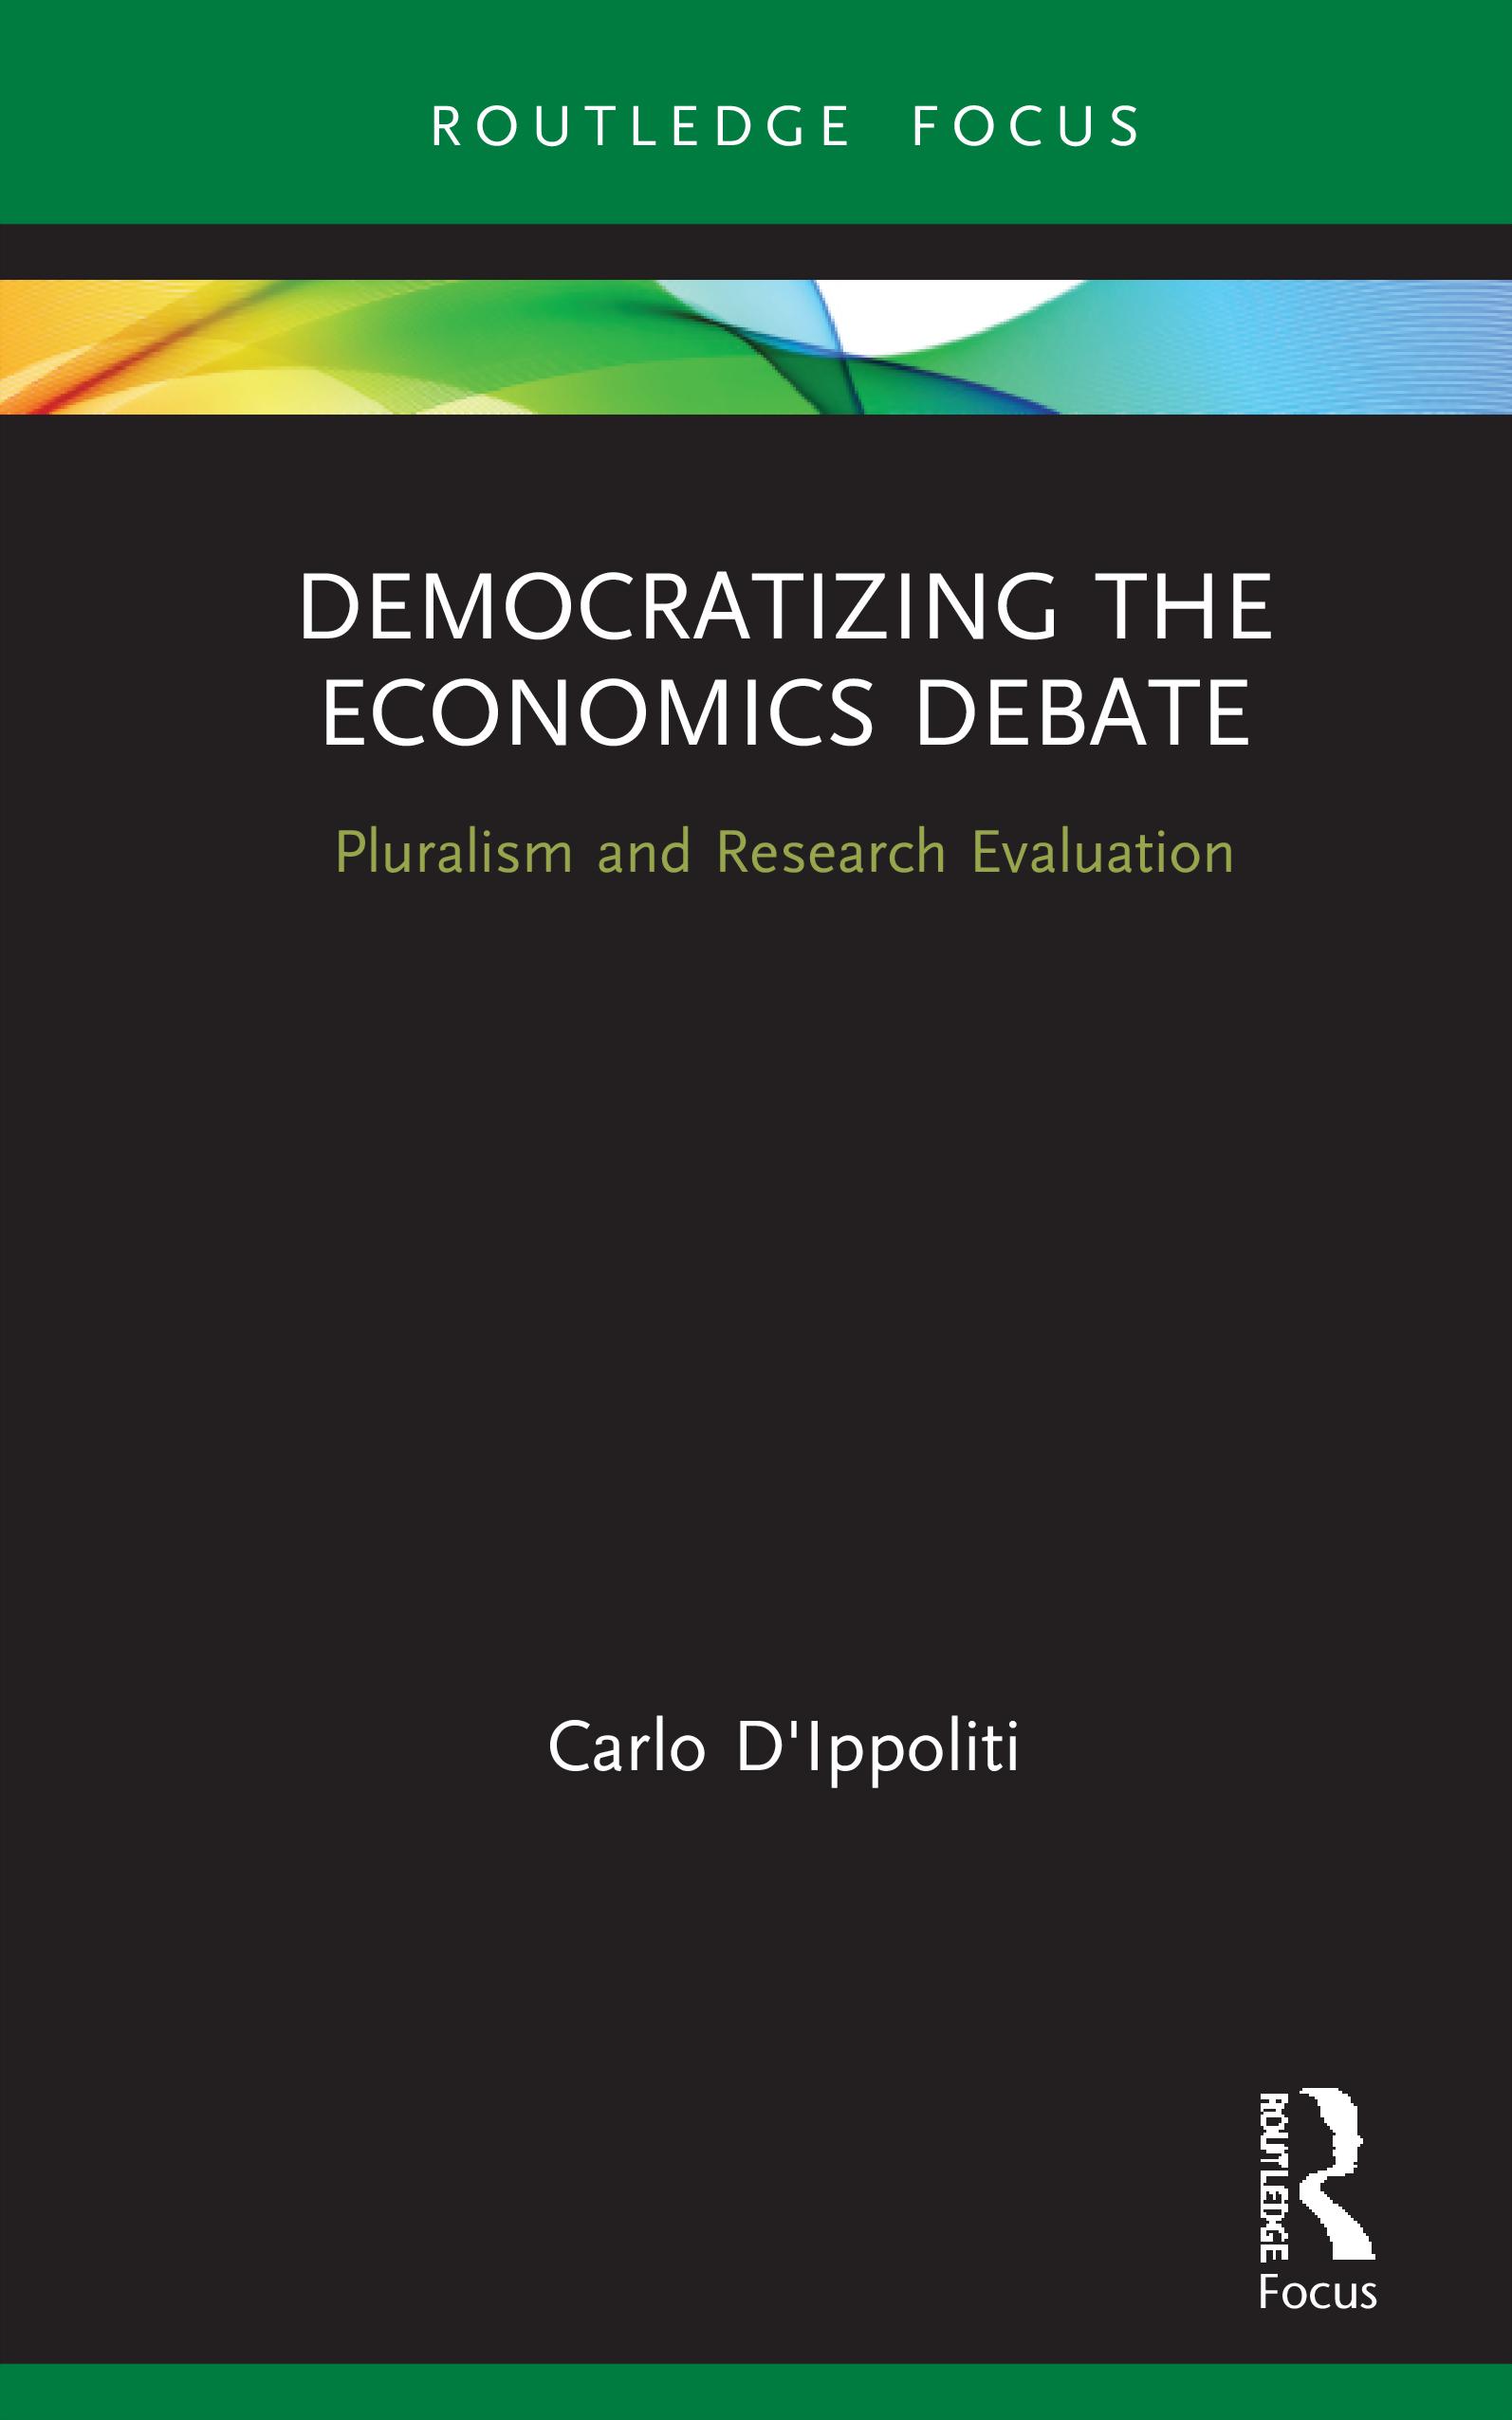 Democratizing the Economics Debate: Pluralism and Research Evaluation book cover